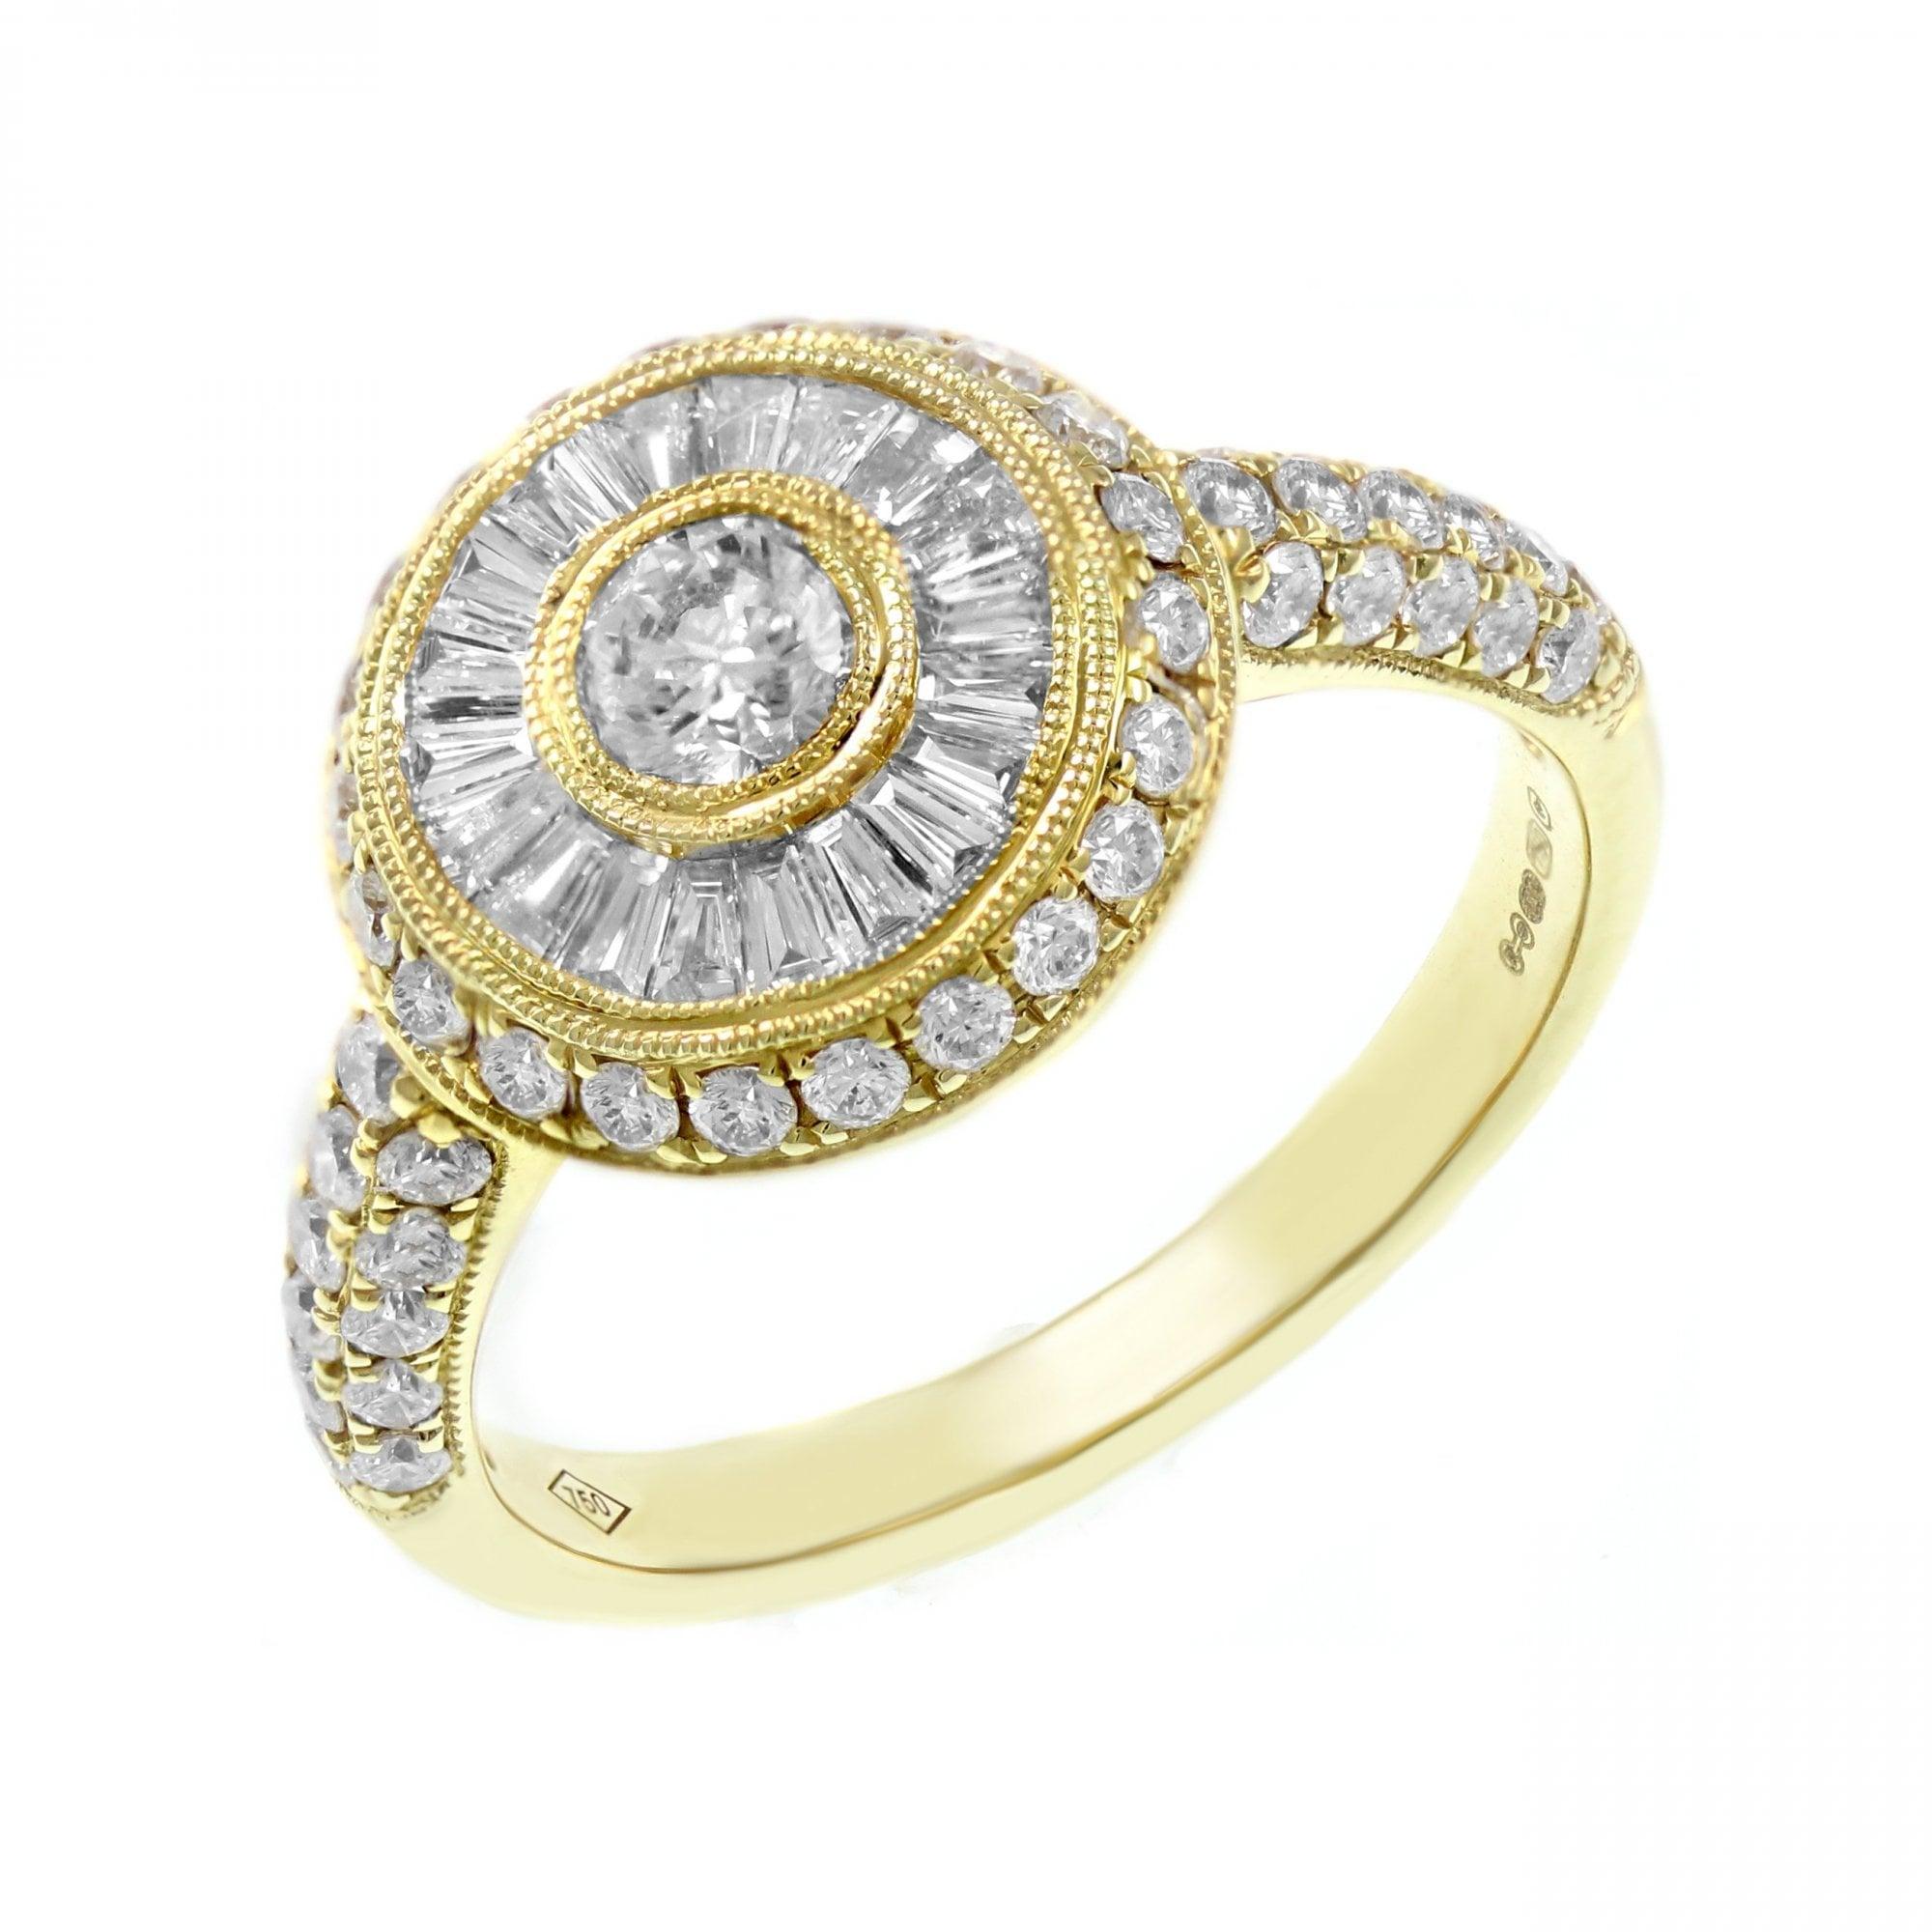 18ct Yellow Gold 1 16ct Circular Art Deco Diamond Ring Jewellery From Mr Harold And Son Uk